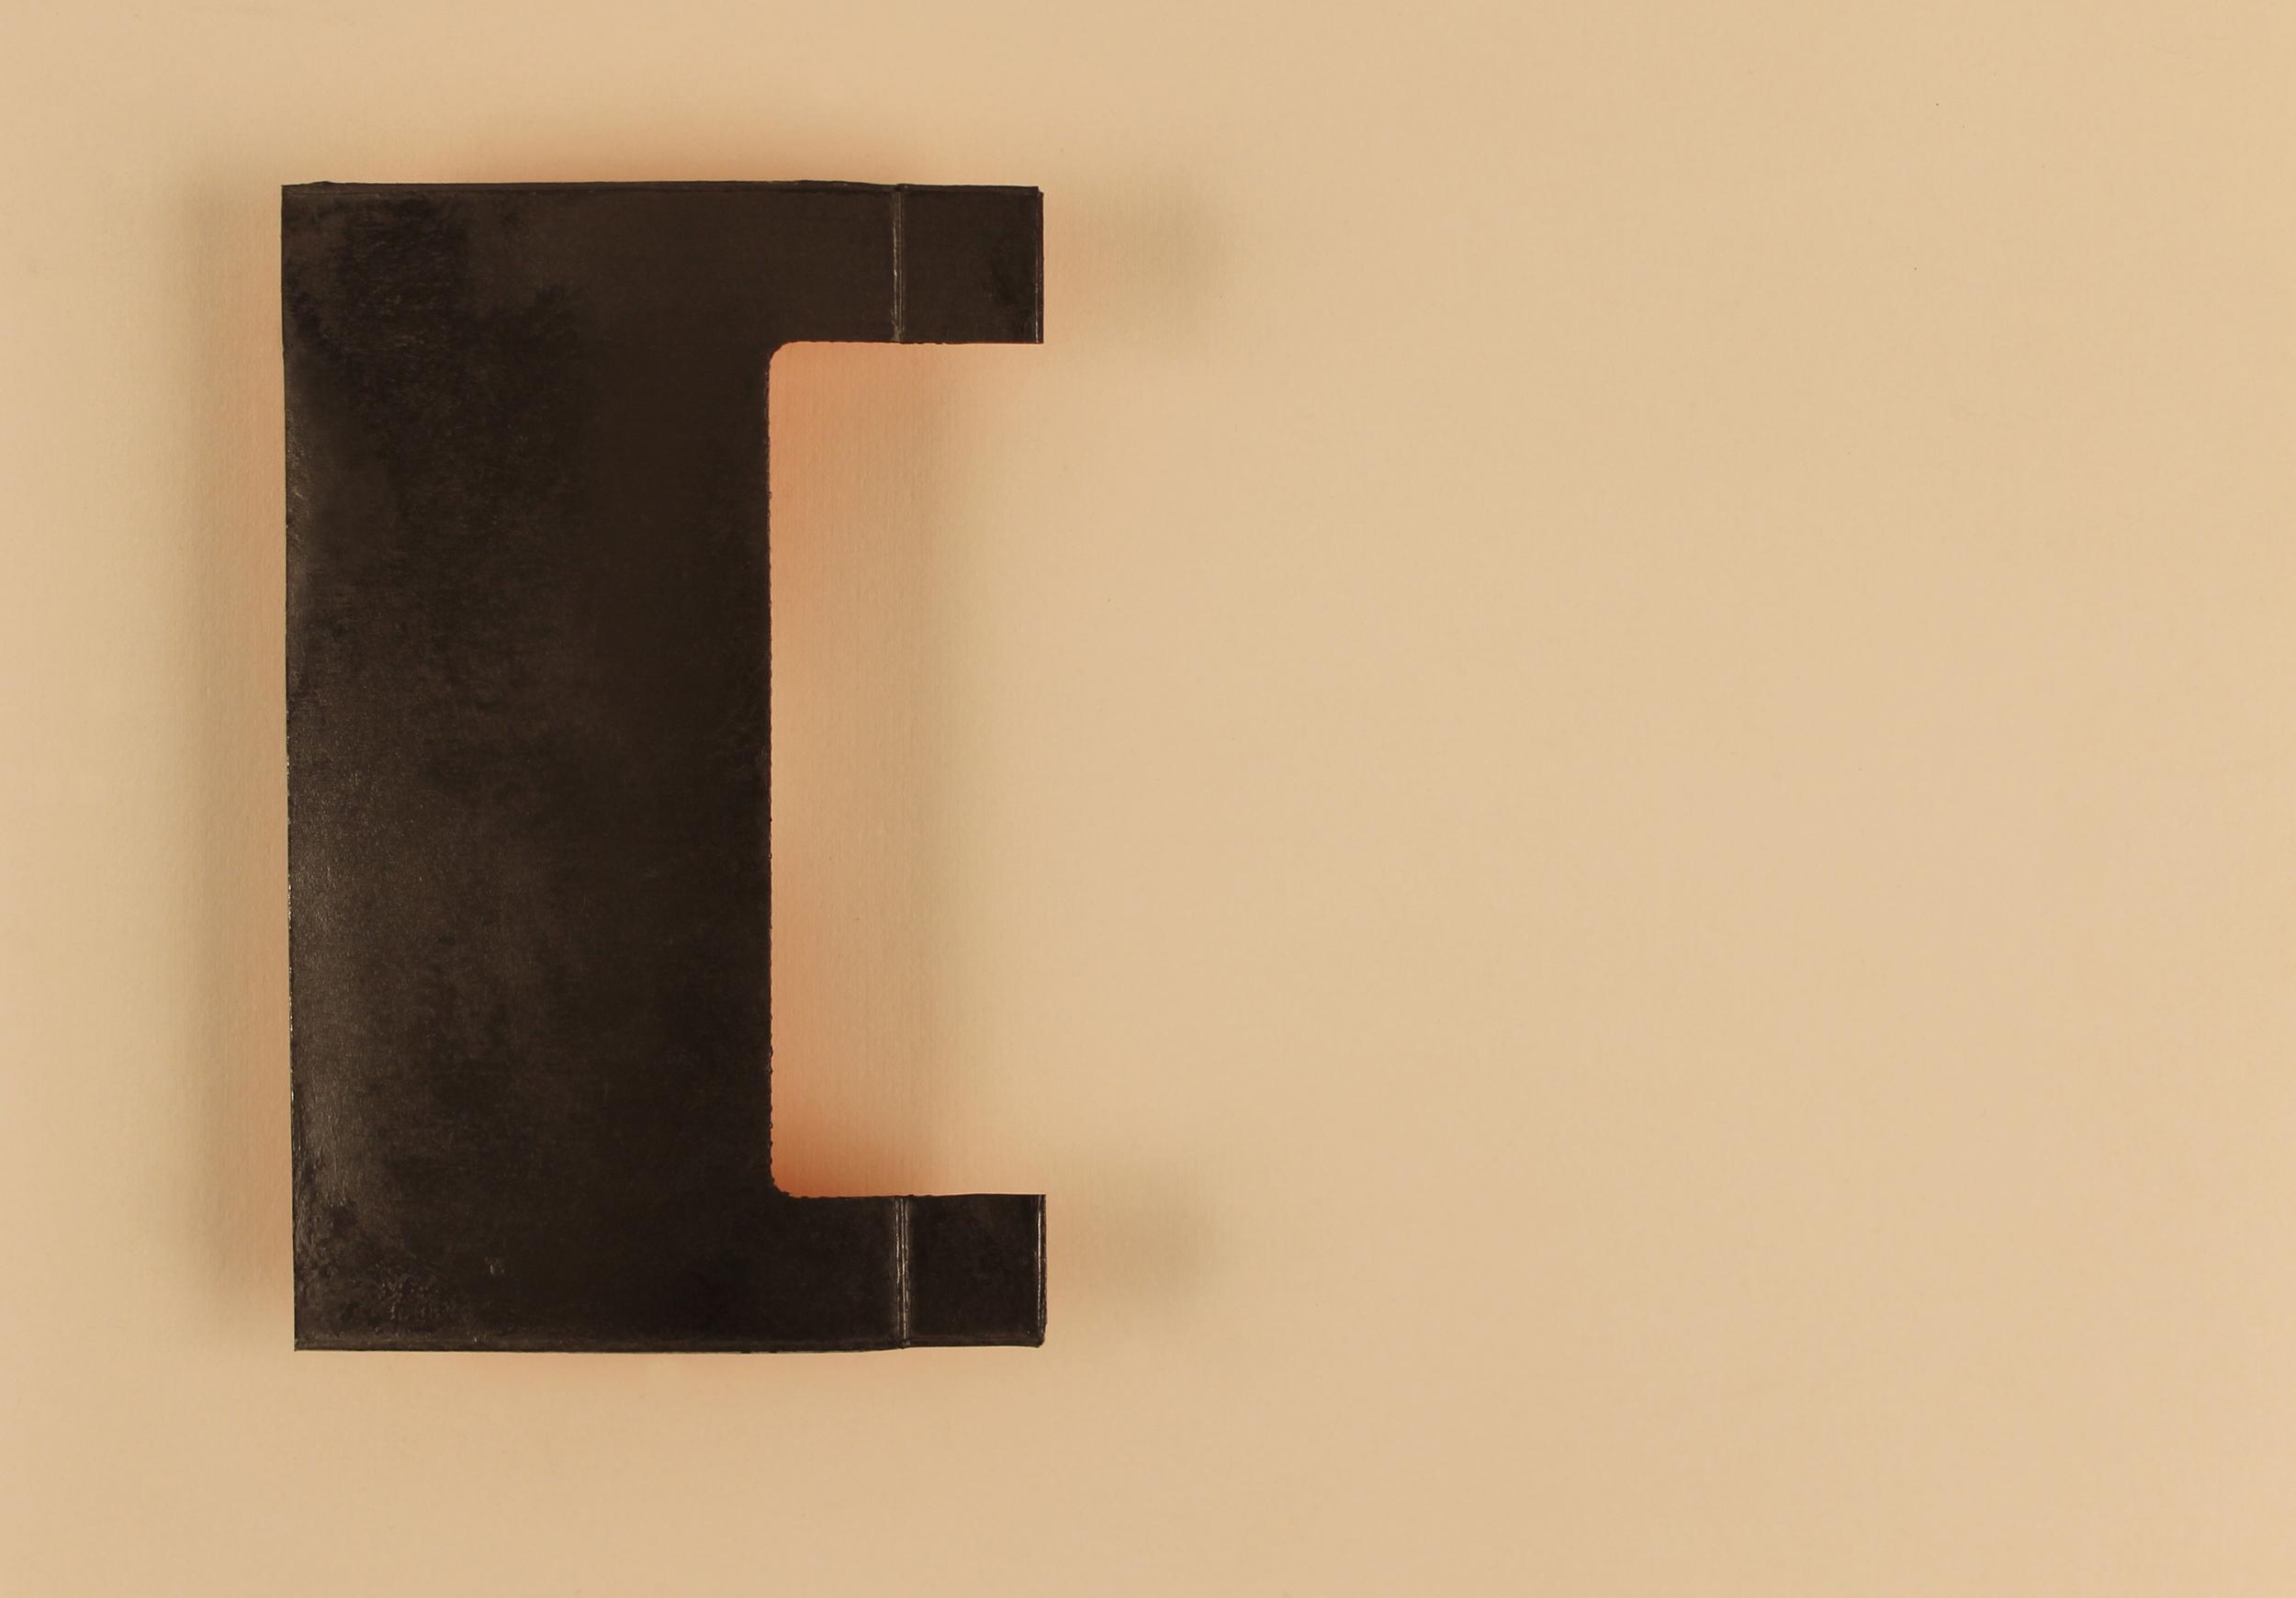 "Chroma (C for Derek Jarman)  Graphite powder, silkscreened pigment, archival wax on cardboard 14"" x 19.5"" 2015"